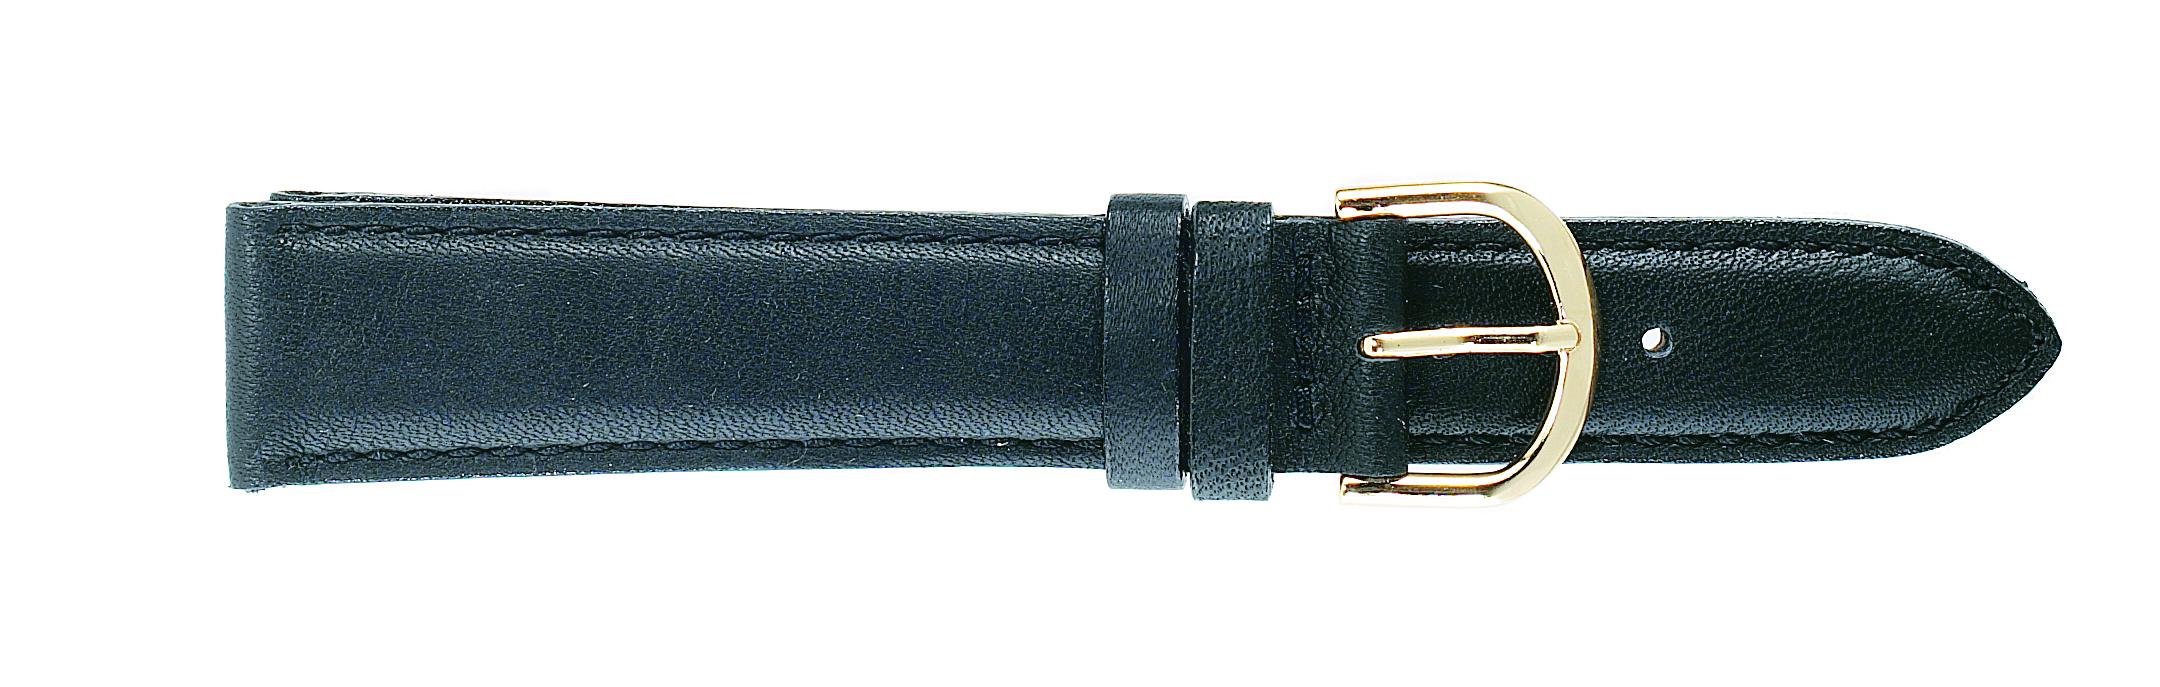 24mm Padded Calf Black Strap Long -0